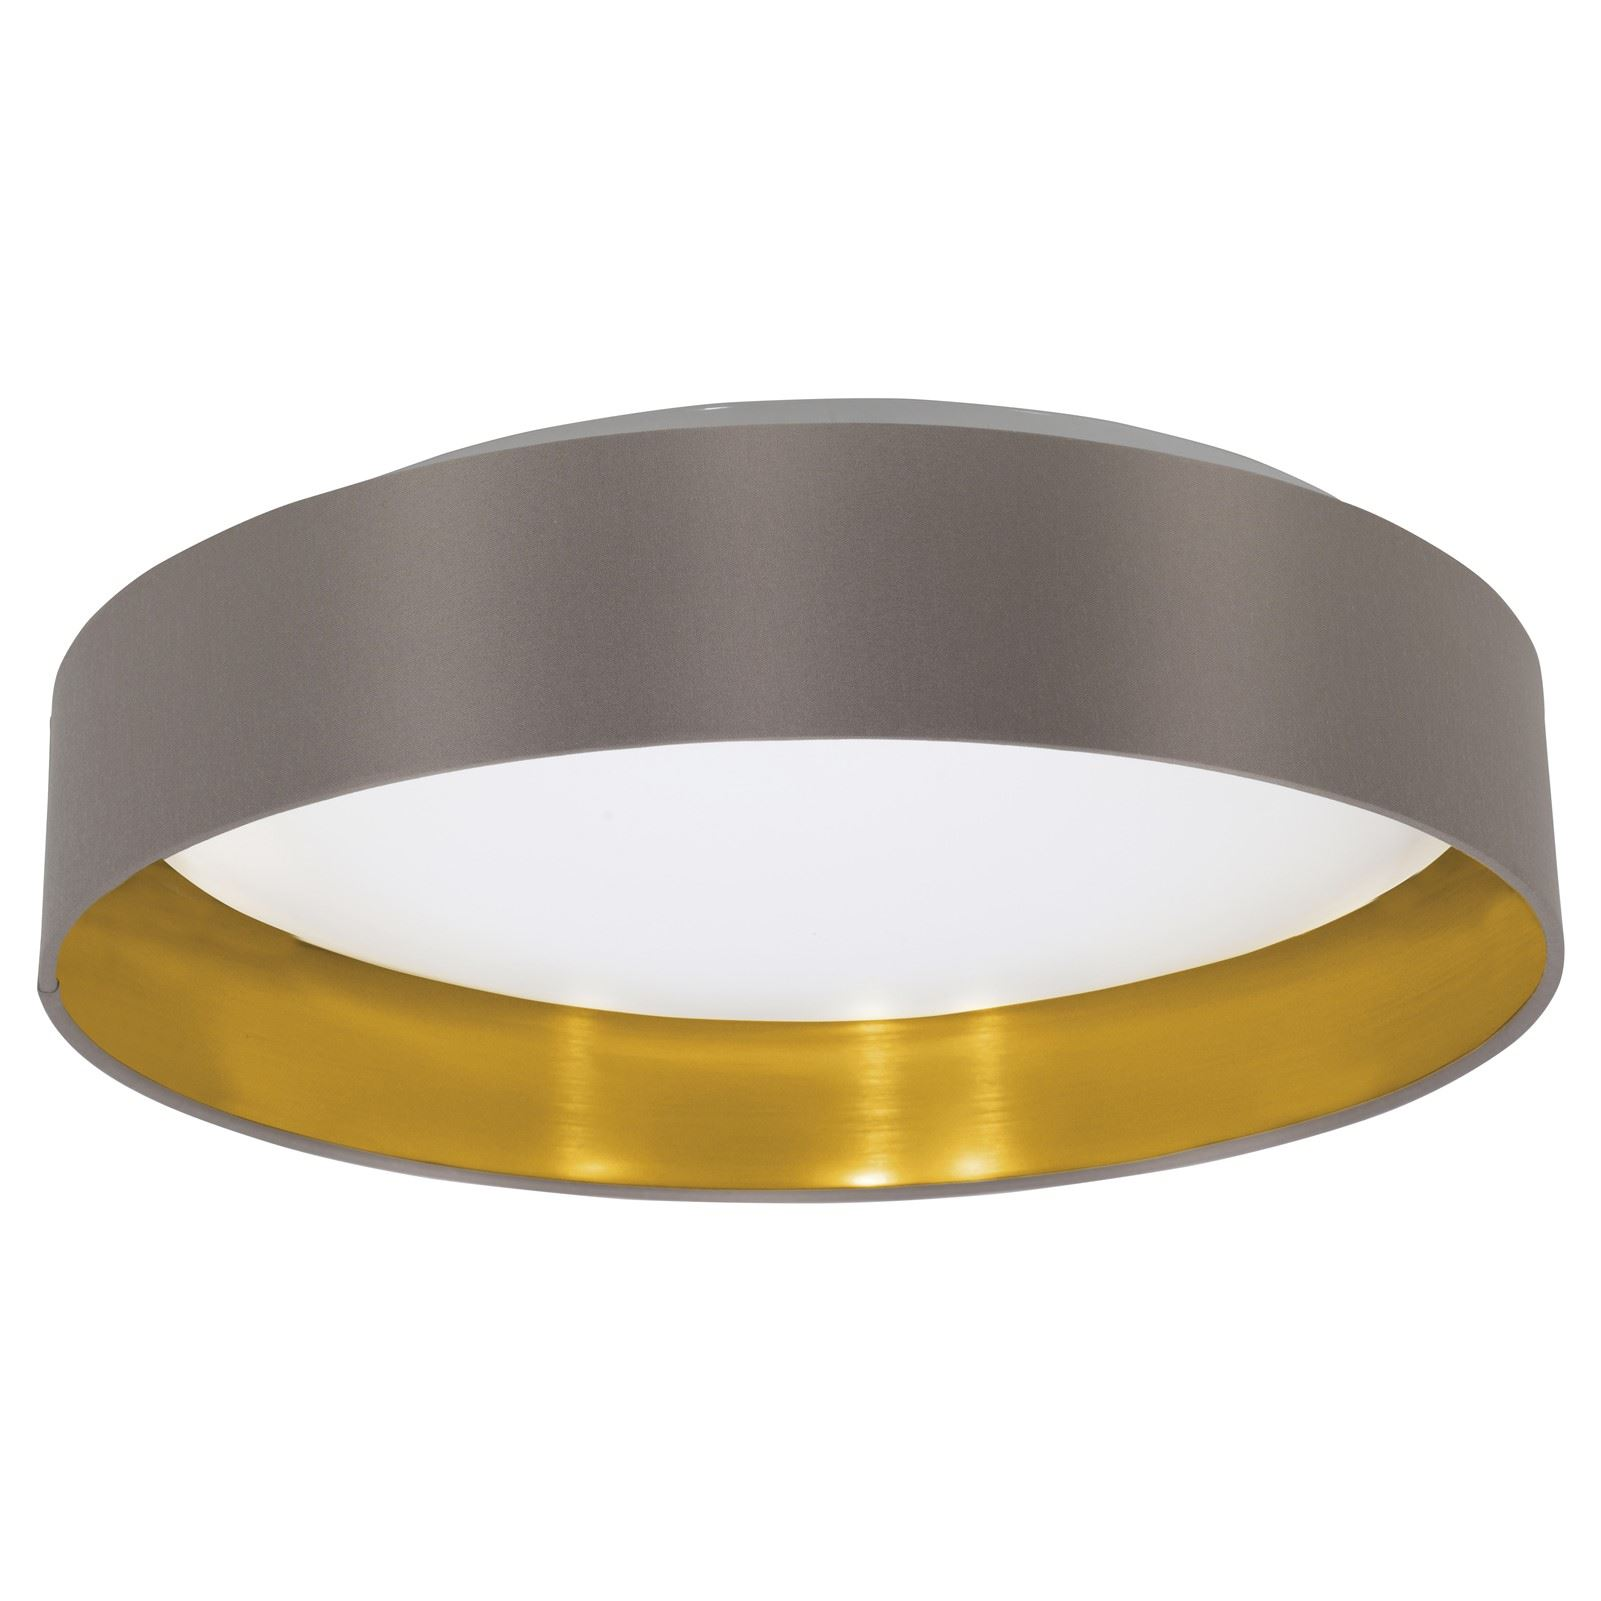 MASERLO LED Stylish Ceiling Light Plastic Steel Fabric Cappuccino Shade